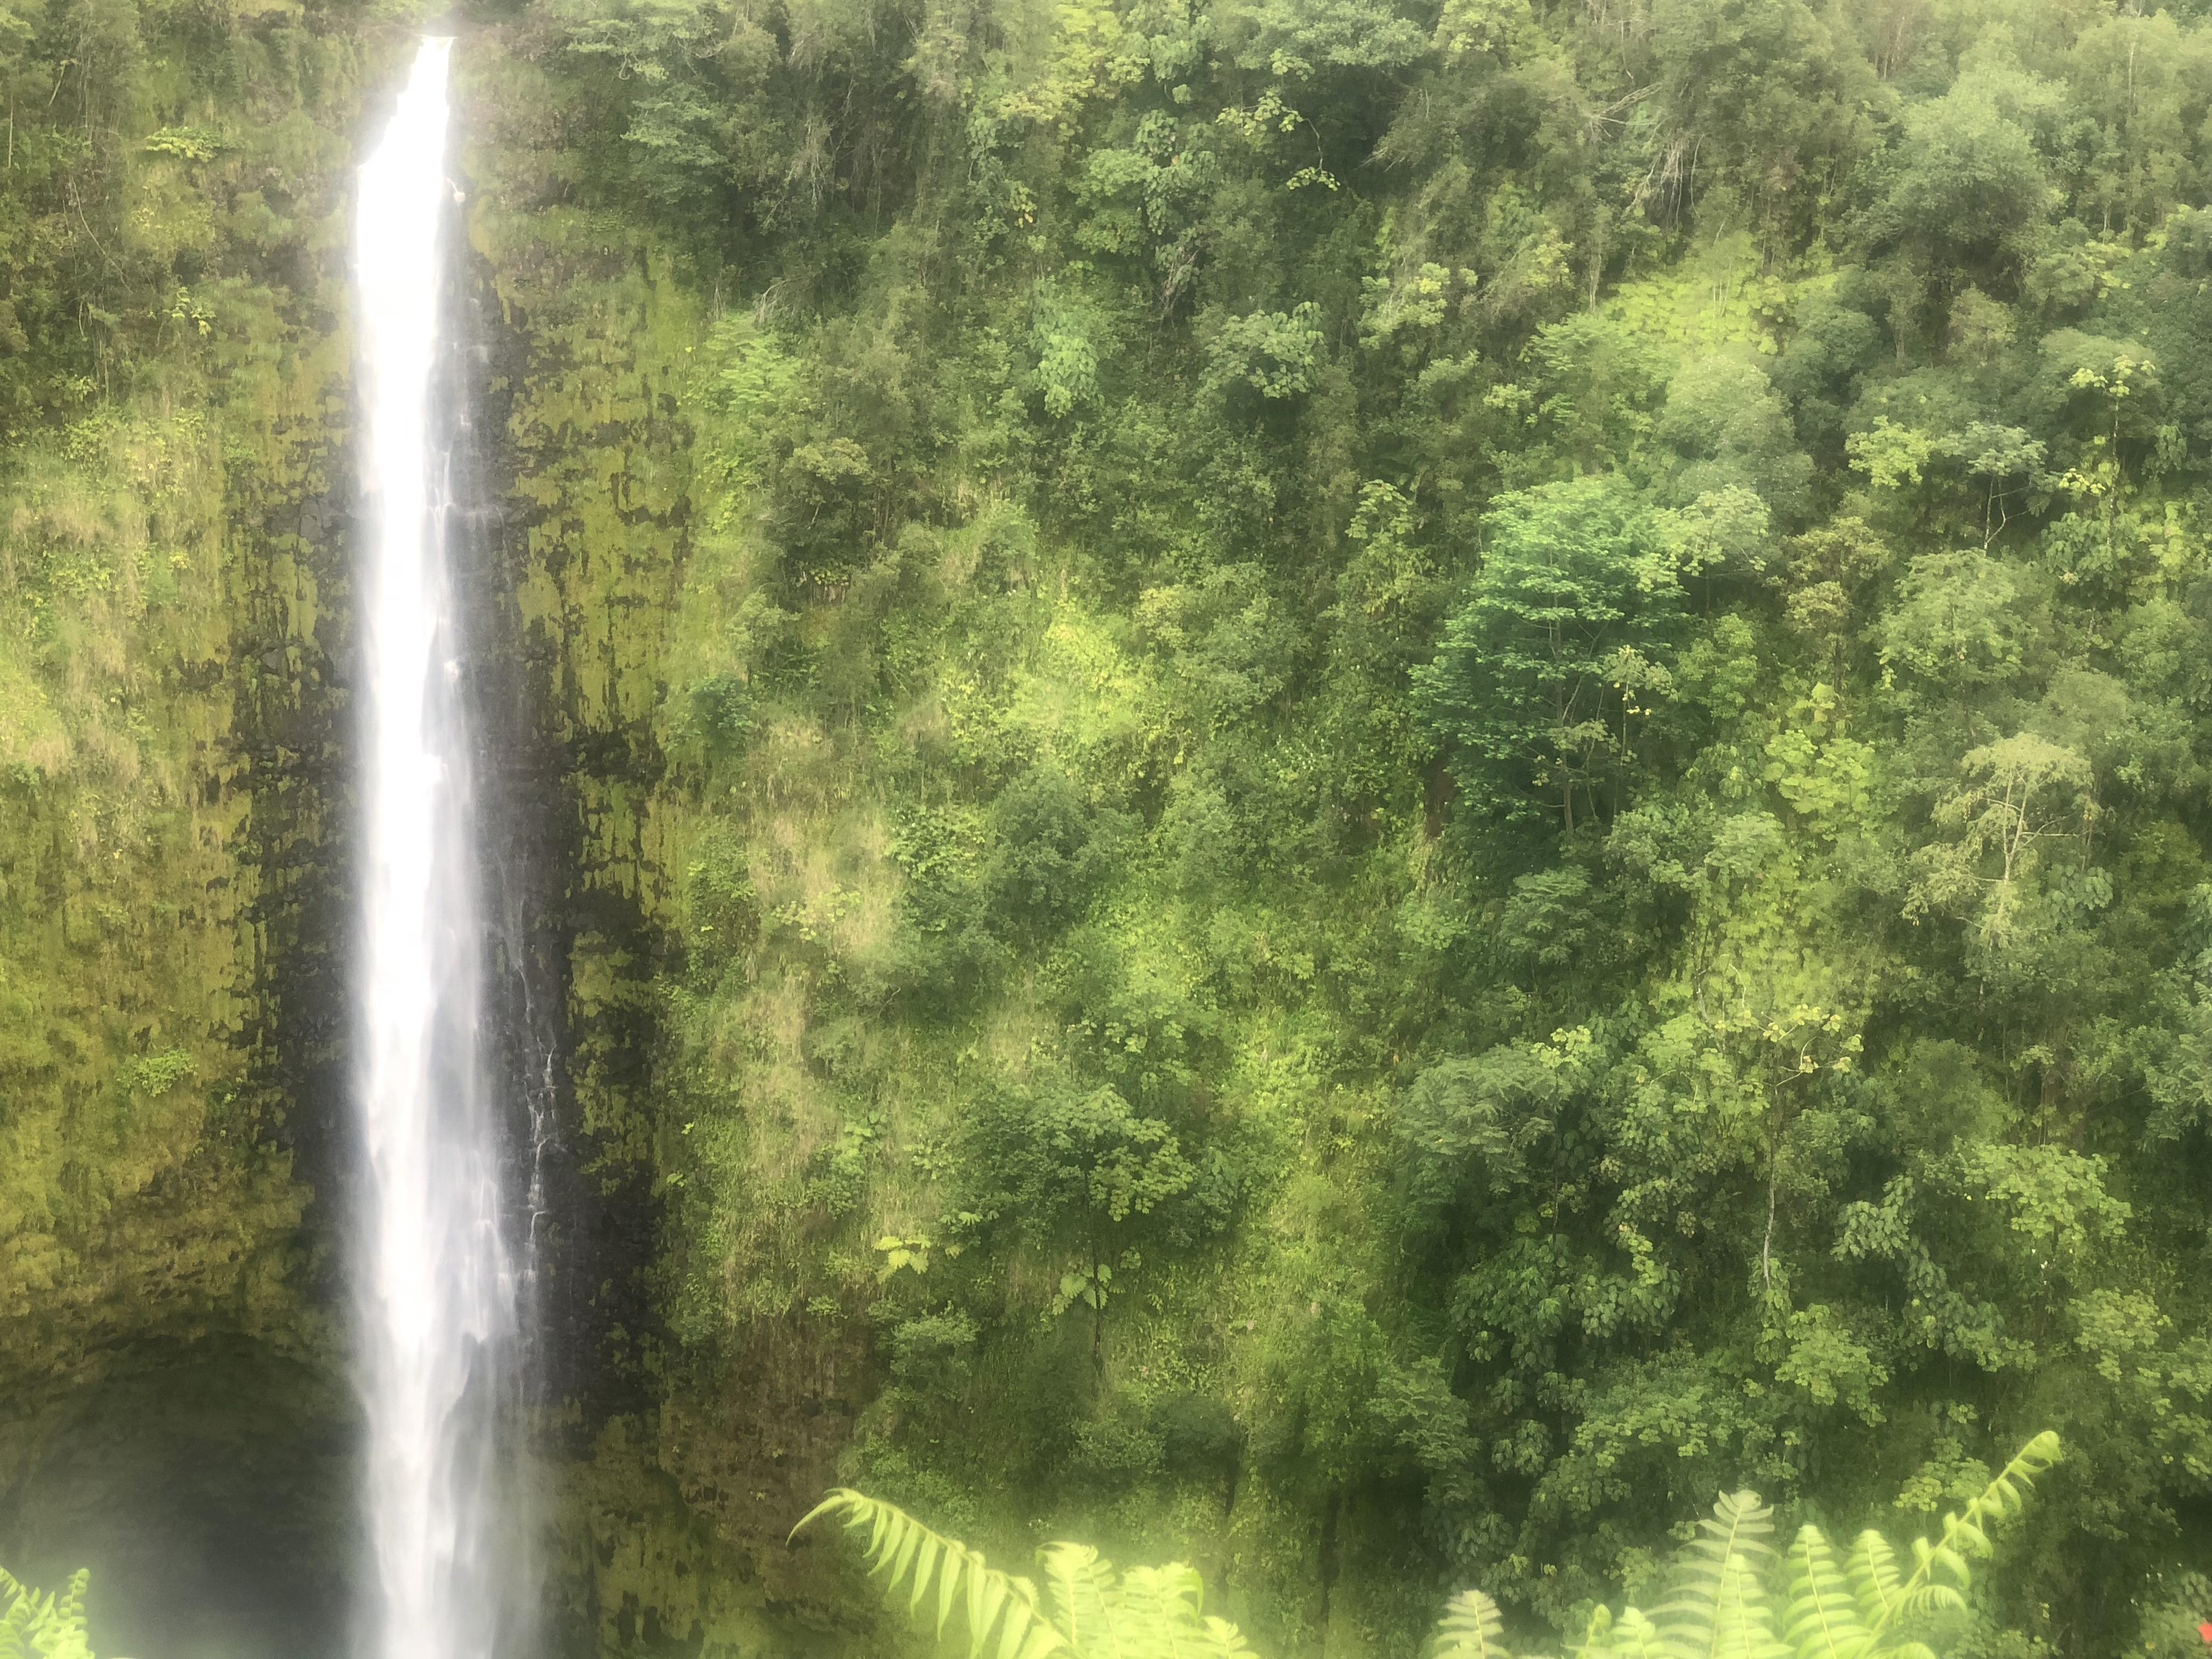 akaka falls ||| hilo hawaii || usa